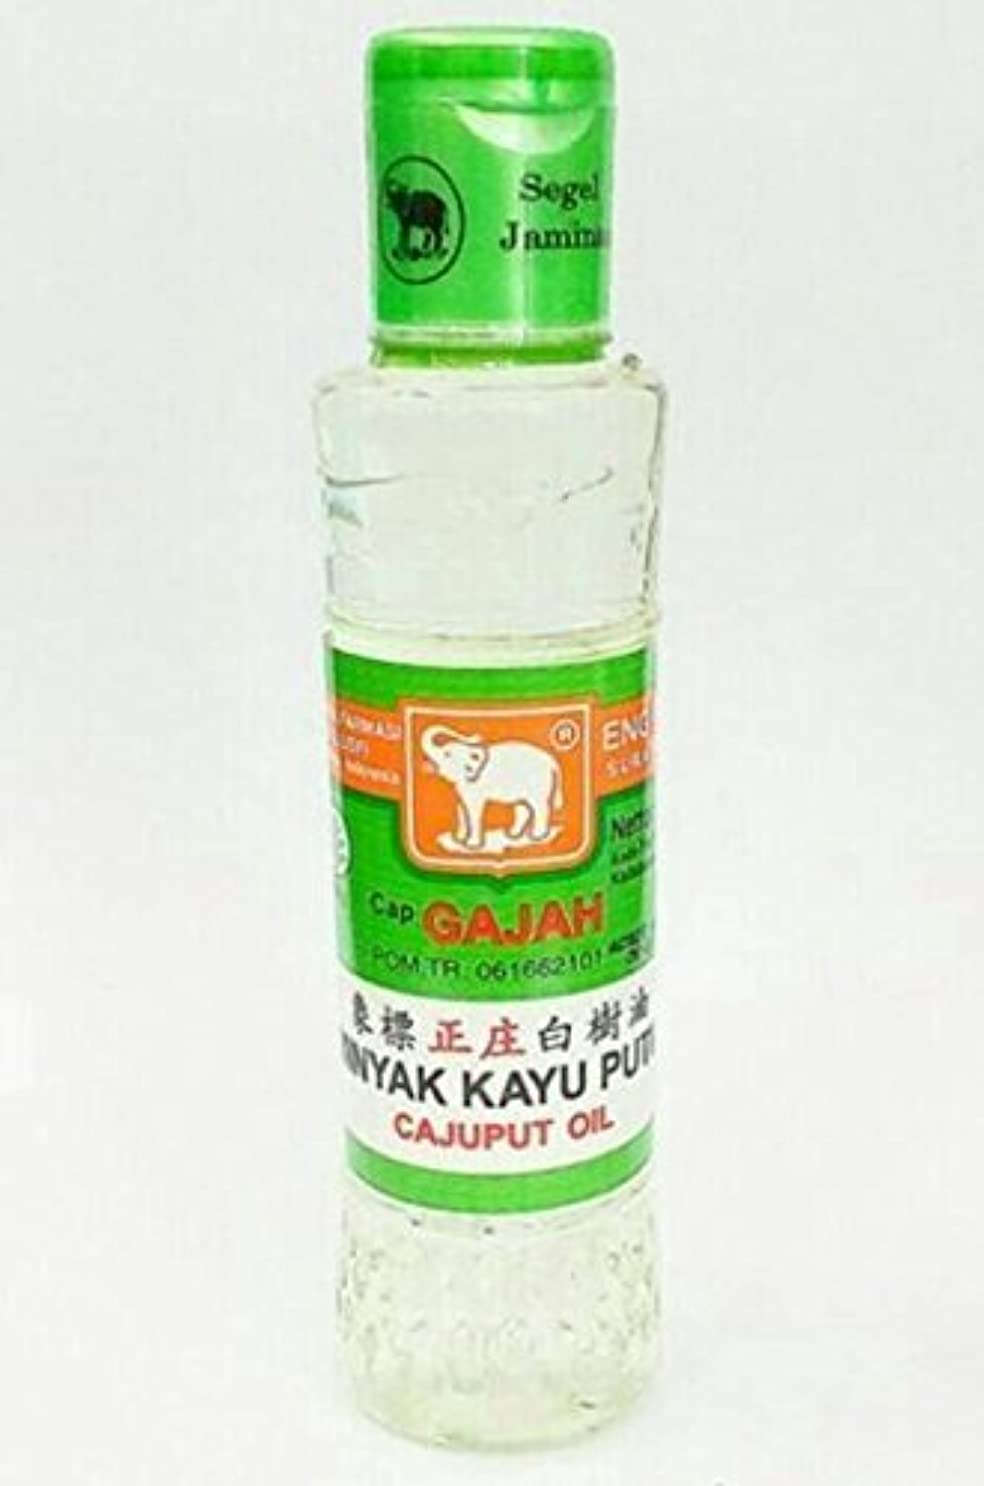 スペード亜熱帯単にCap Gajah Minyak Kayu Putih - Elephant Brand Cajuput Oil, 120ml by Elephant Brand